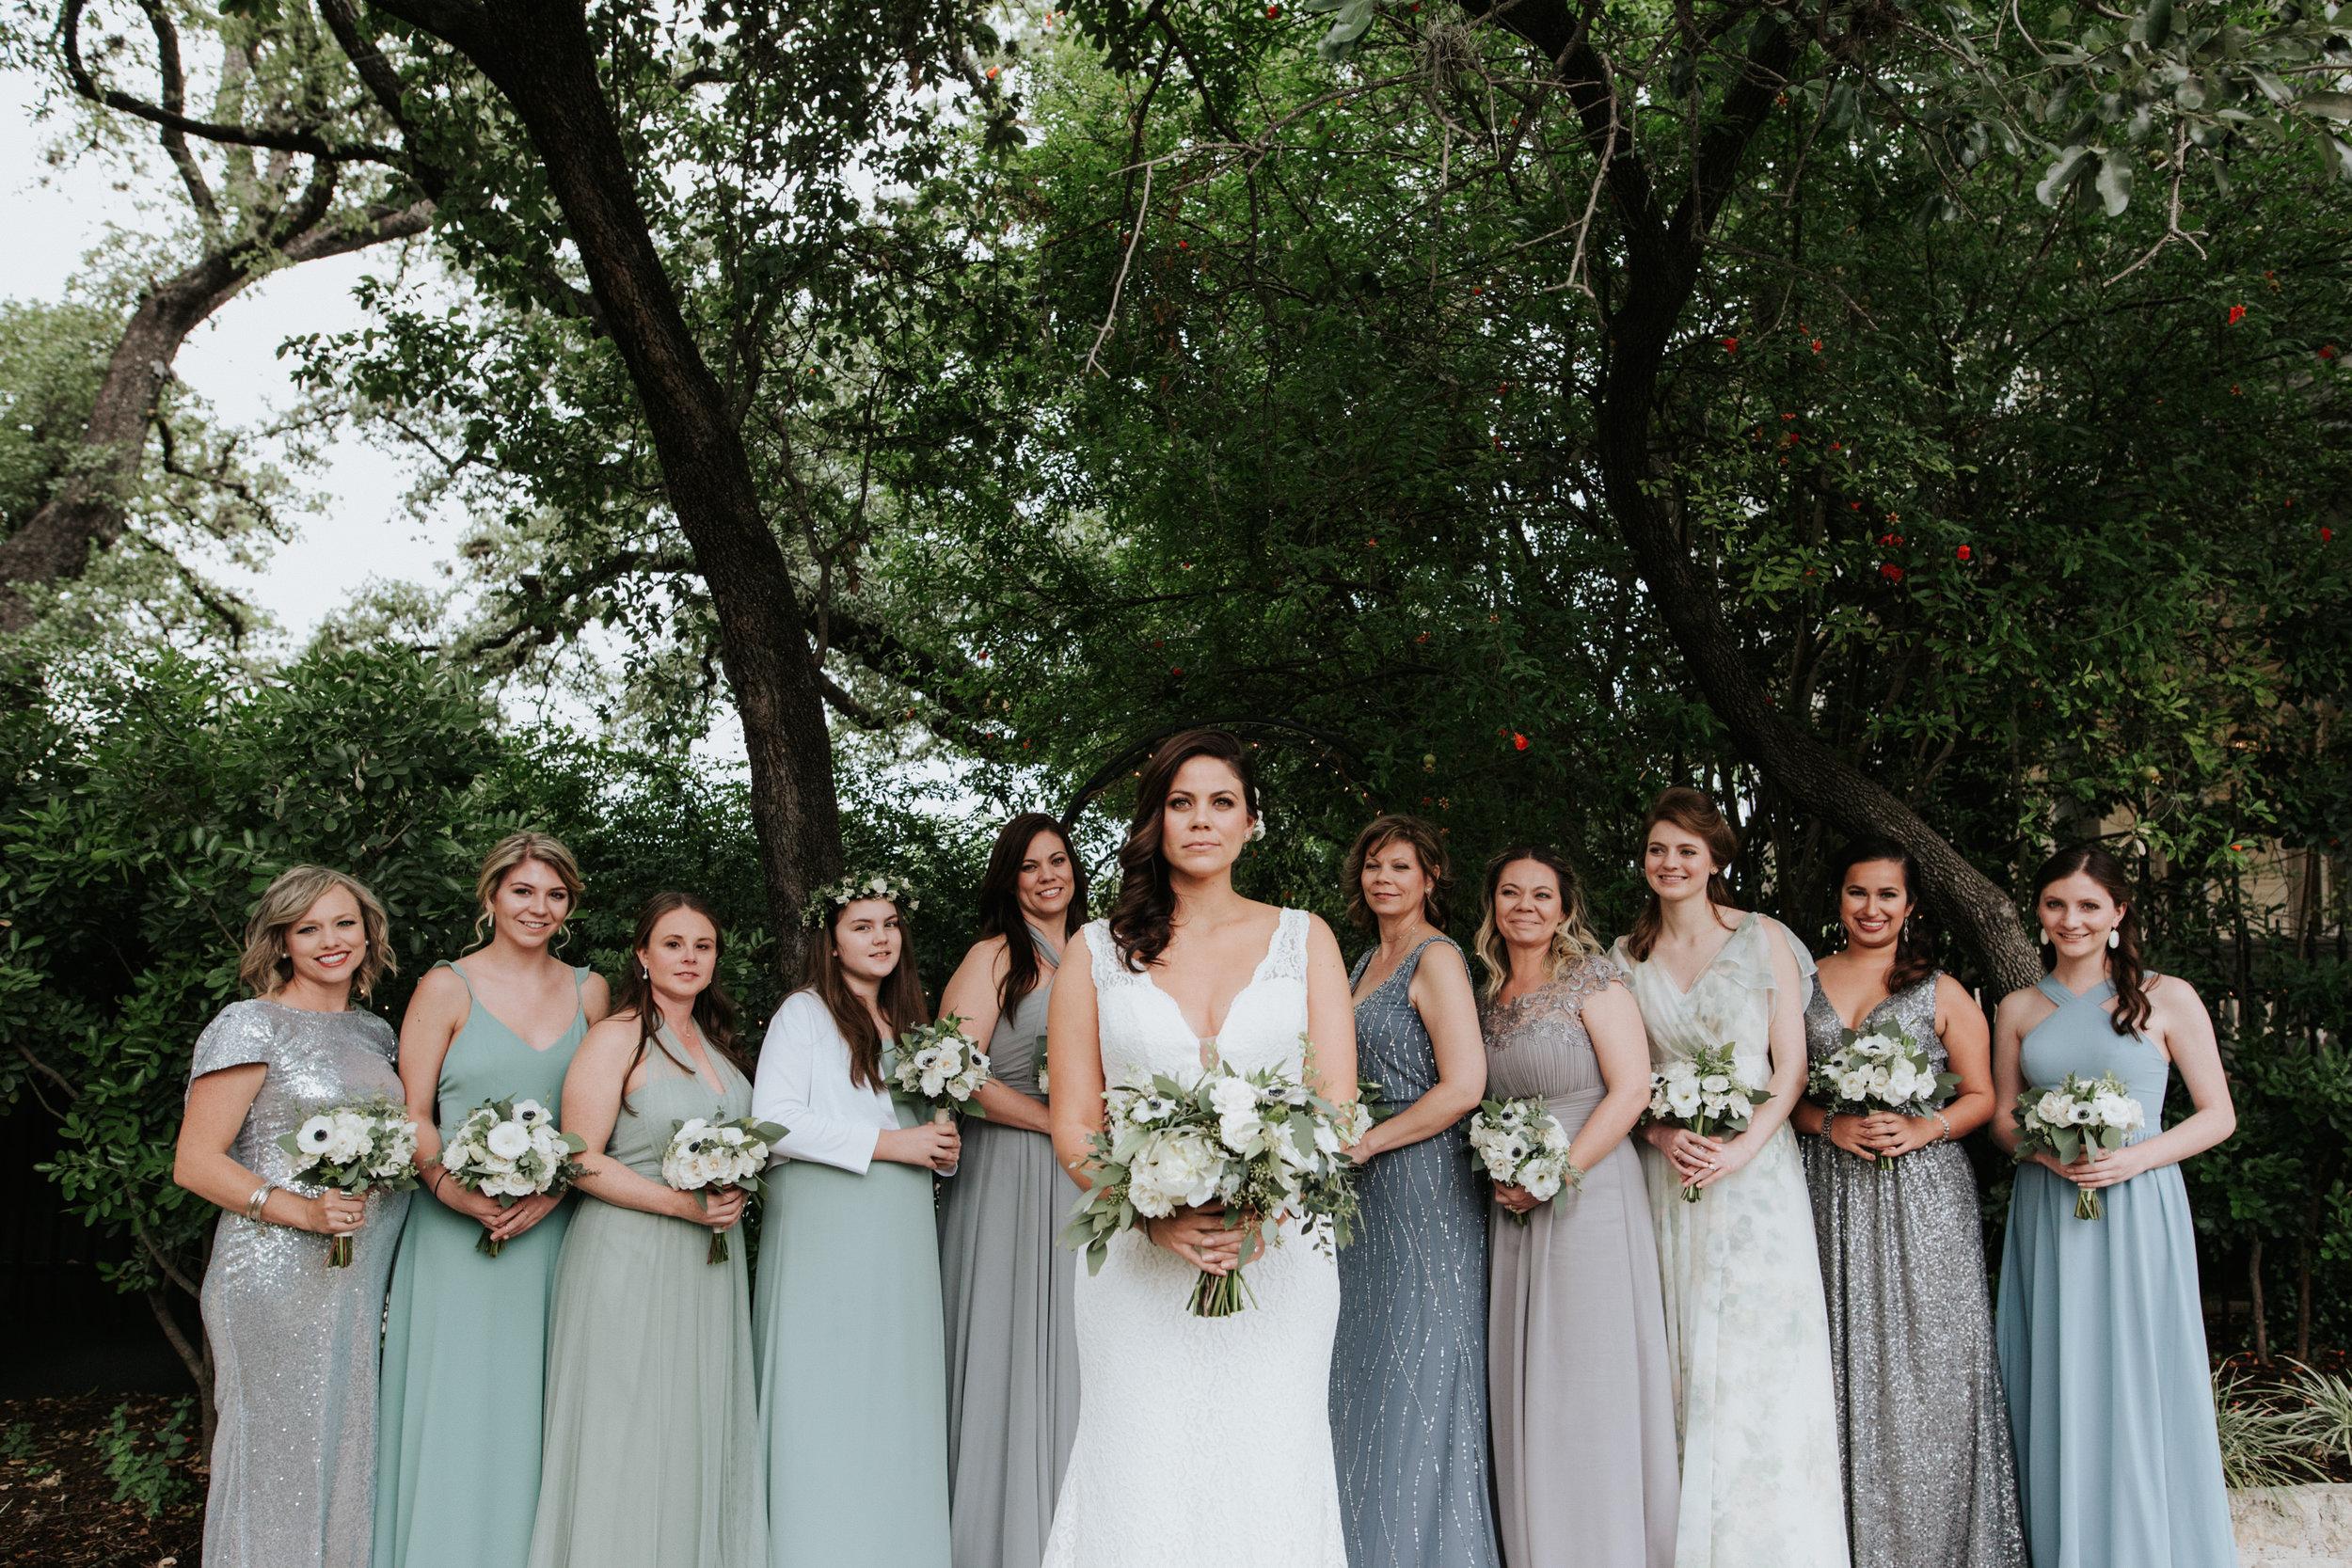 Ginny + Mando Wedding - Diana Ascarrunz Photography-284.JPG